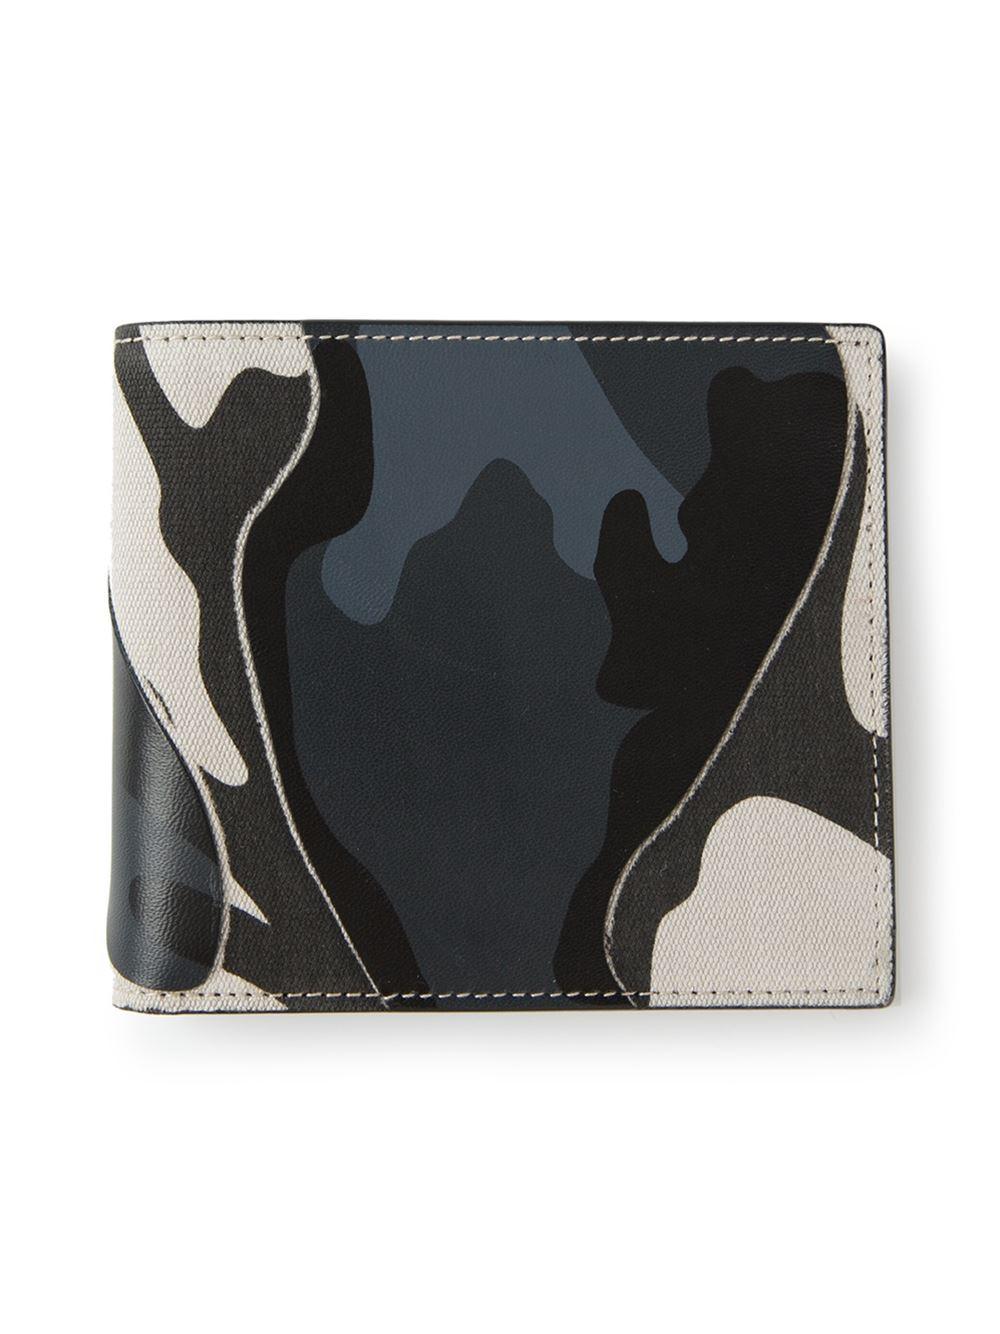 Valentino Garavani camouflage wallet Quality Cheap Best Wholesale Cheap Sale Ebay Buy Cheap Best Visit New For Sale IgIKk